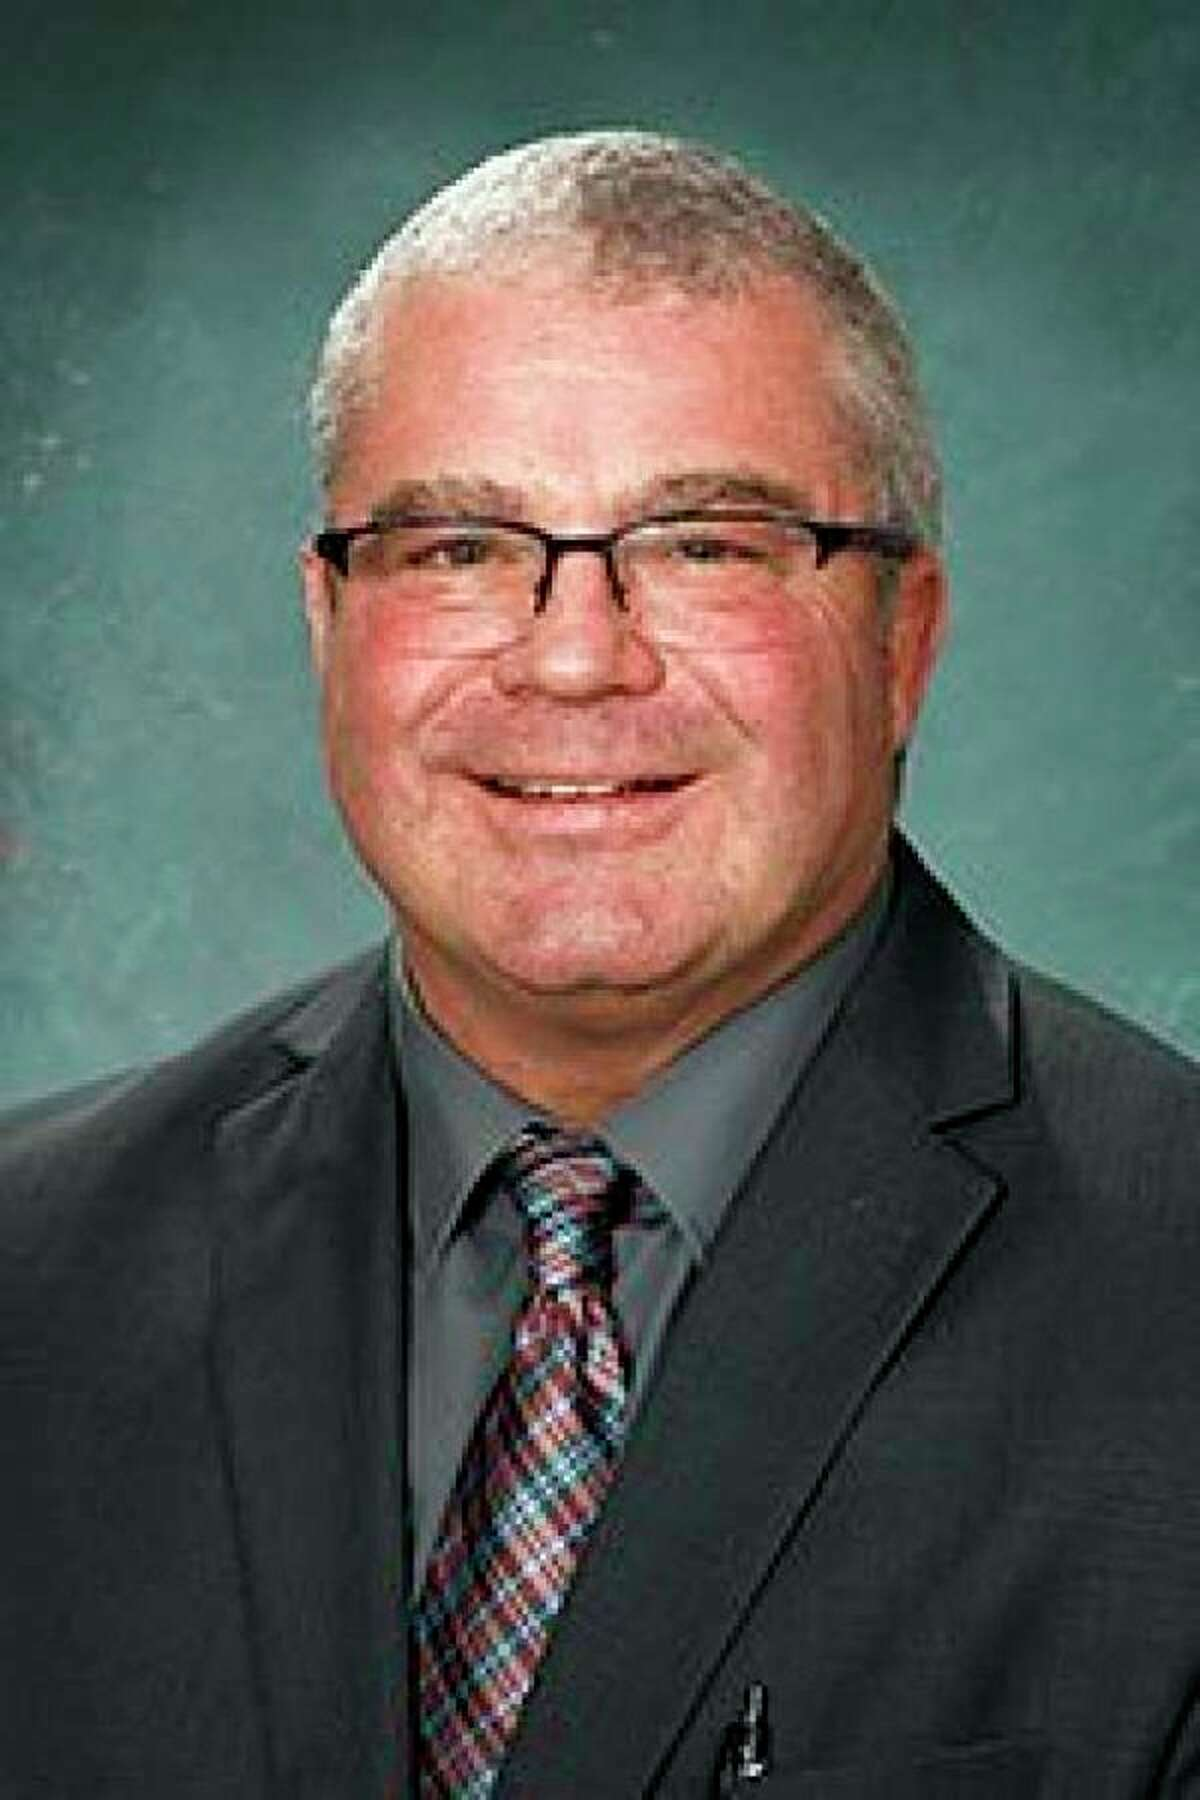 Michigan Sen. Rick Outman